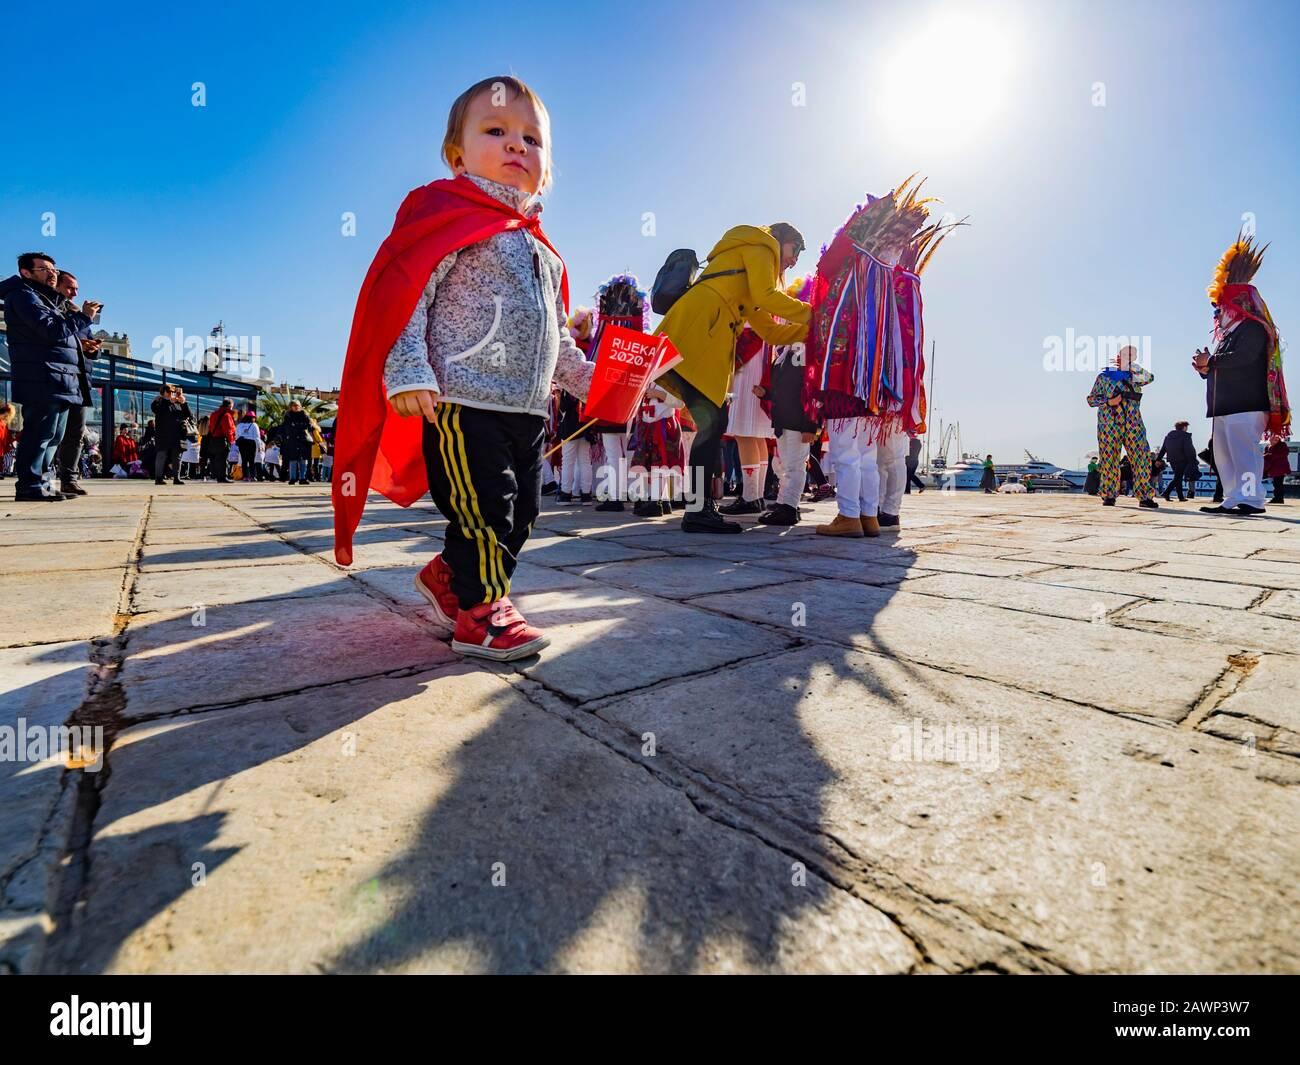 Childrens carnival in Rijeka Croatia Europe Stock Photo